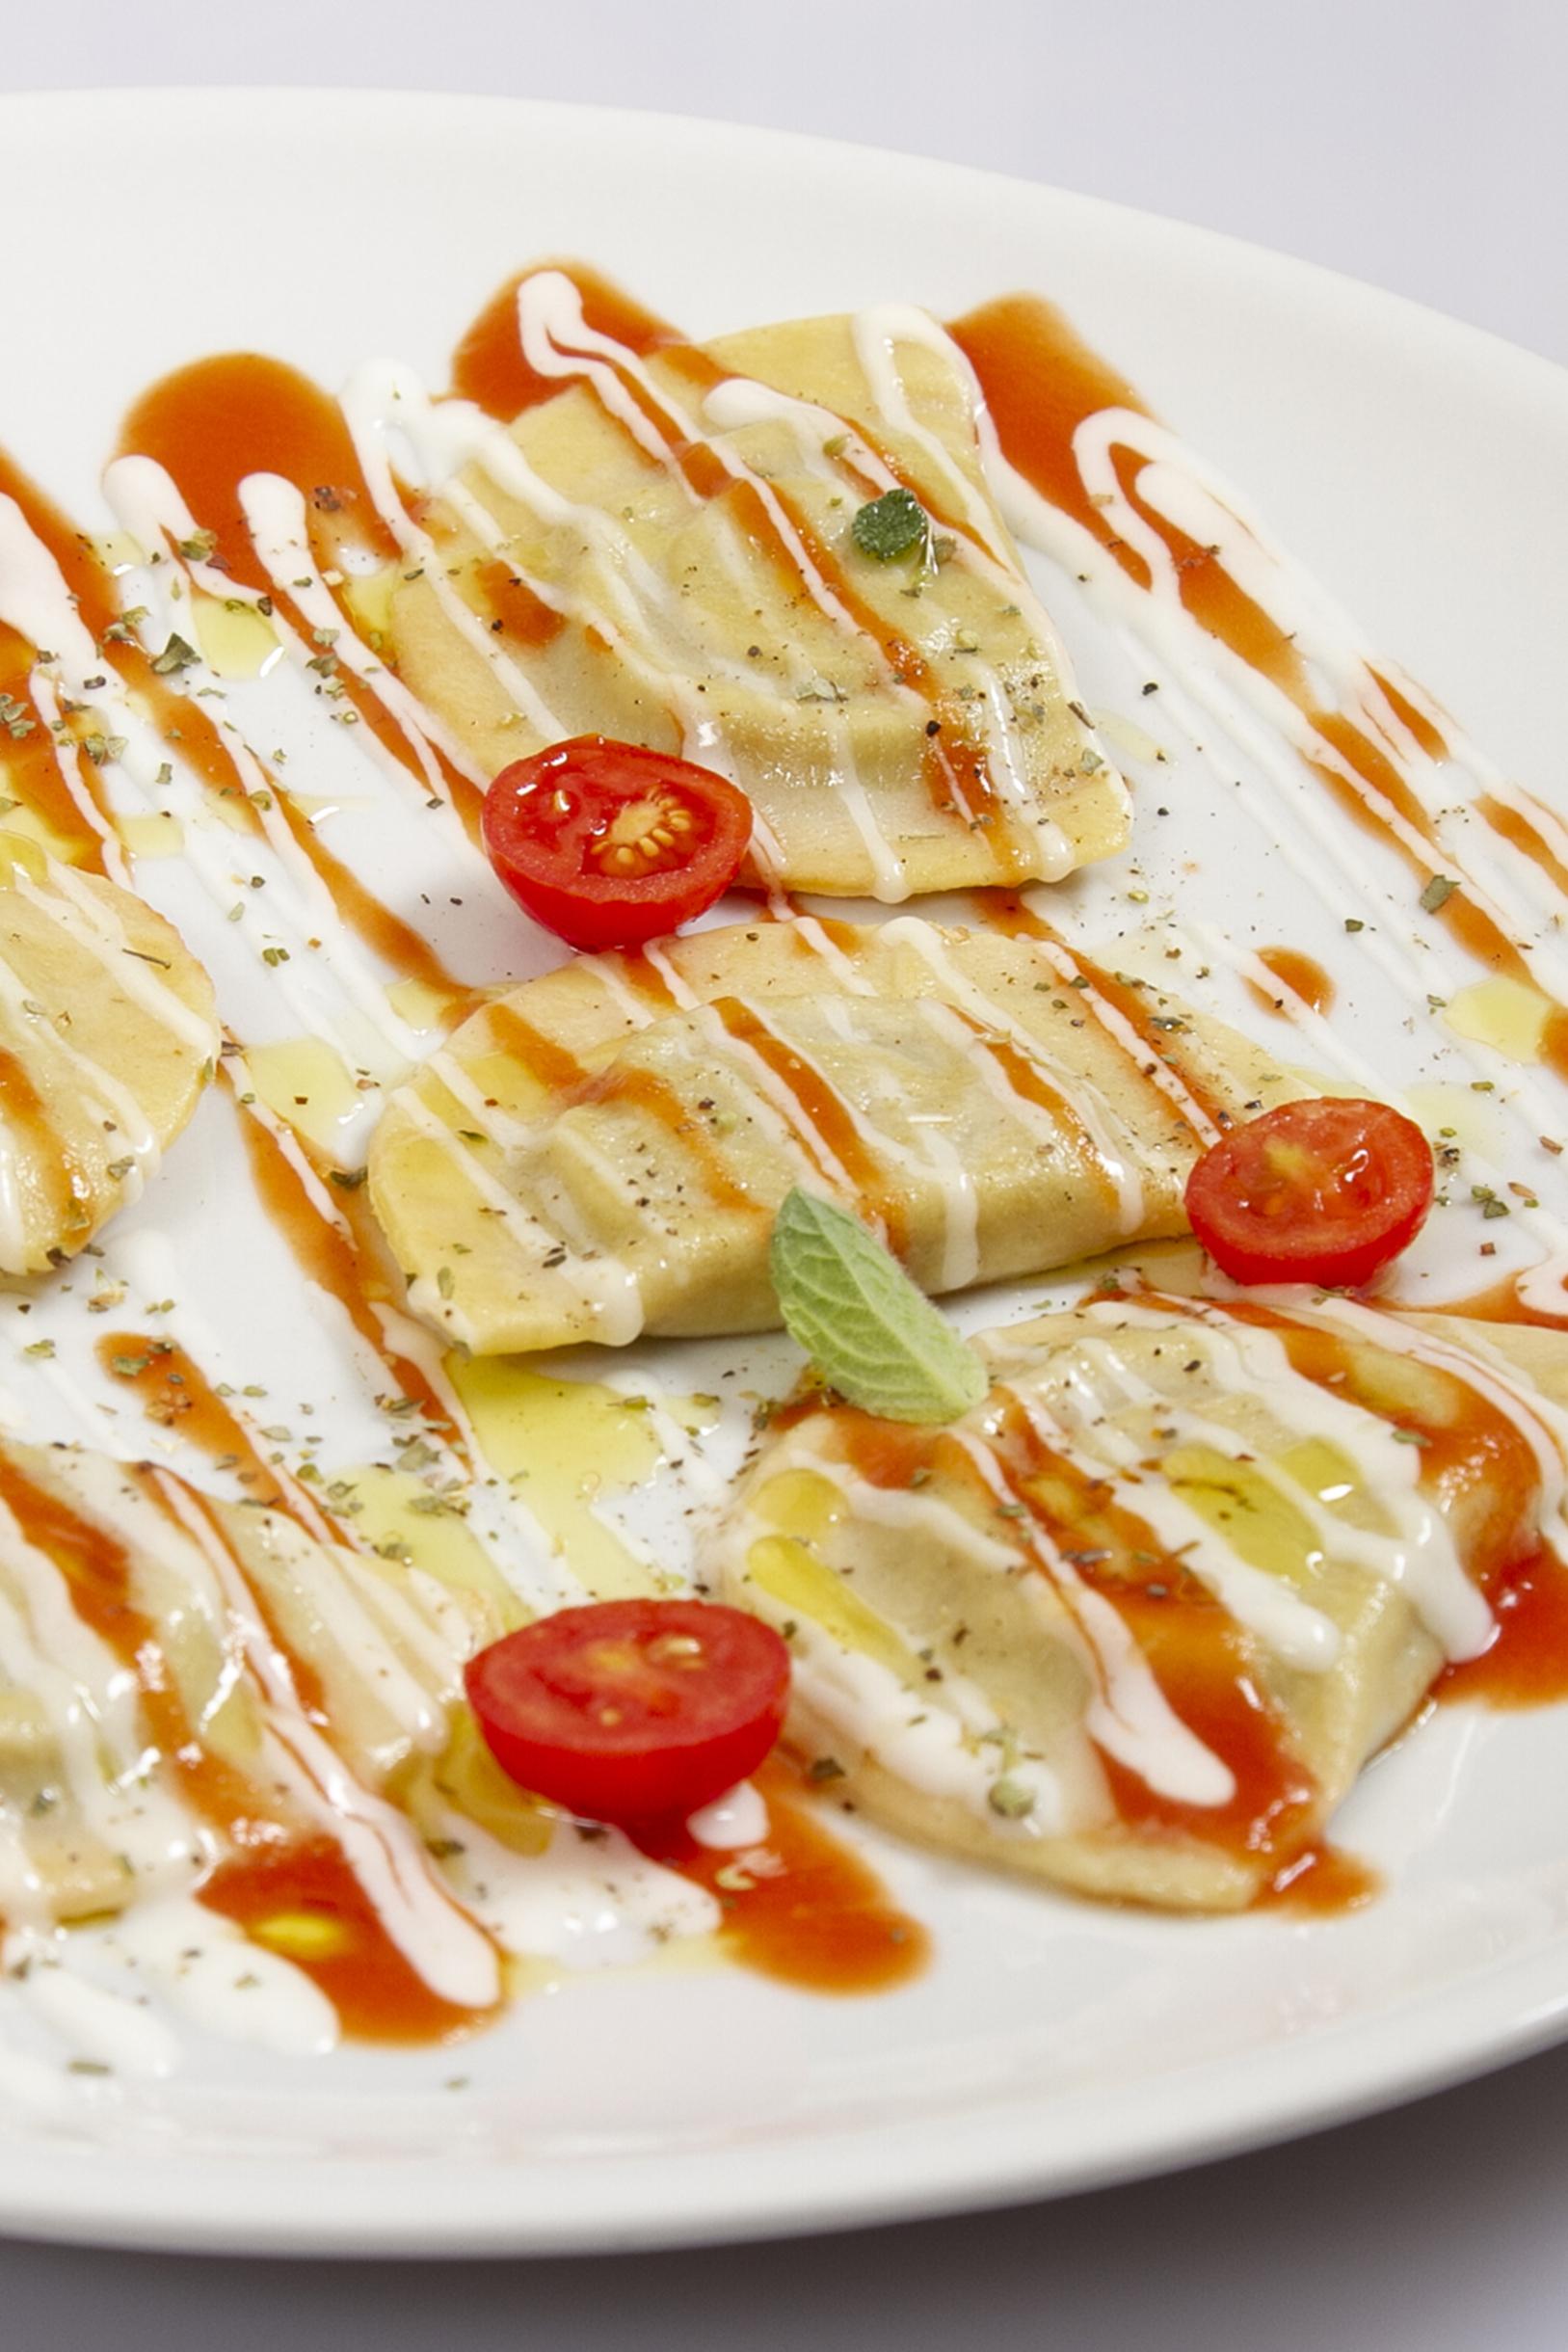 Mezzelune alla parmigiana